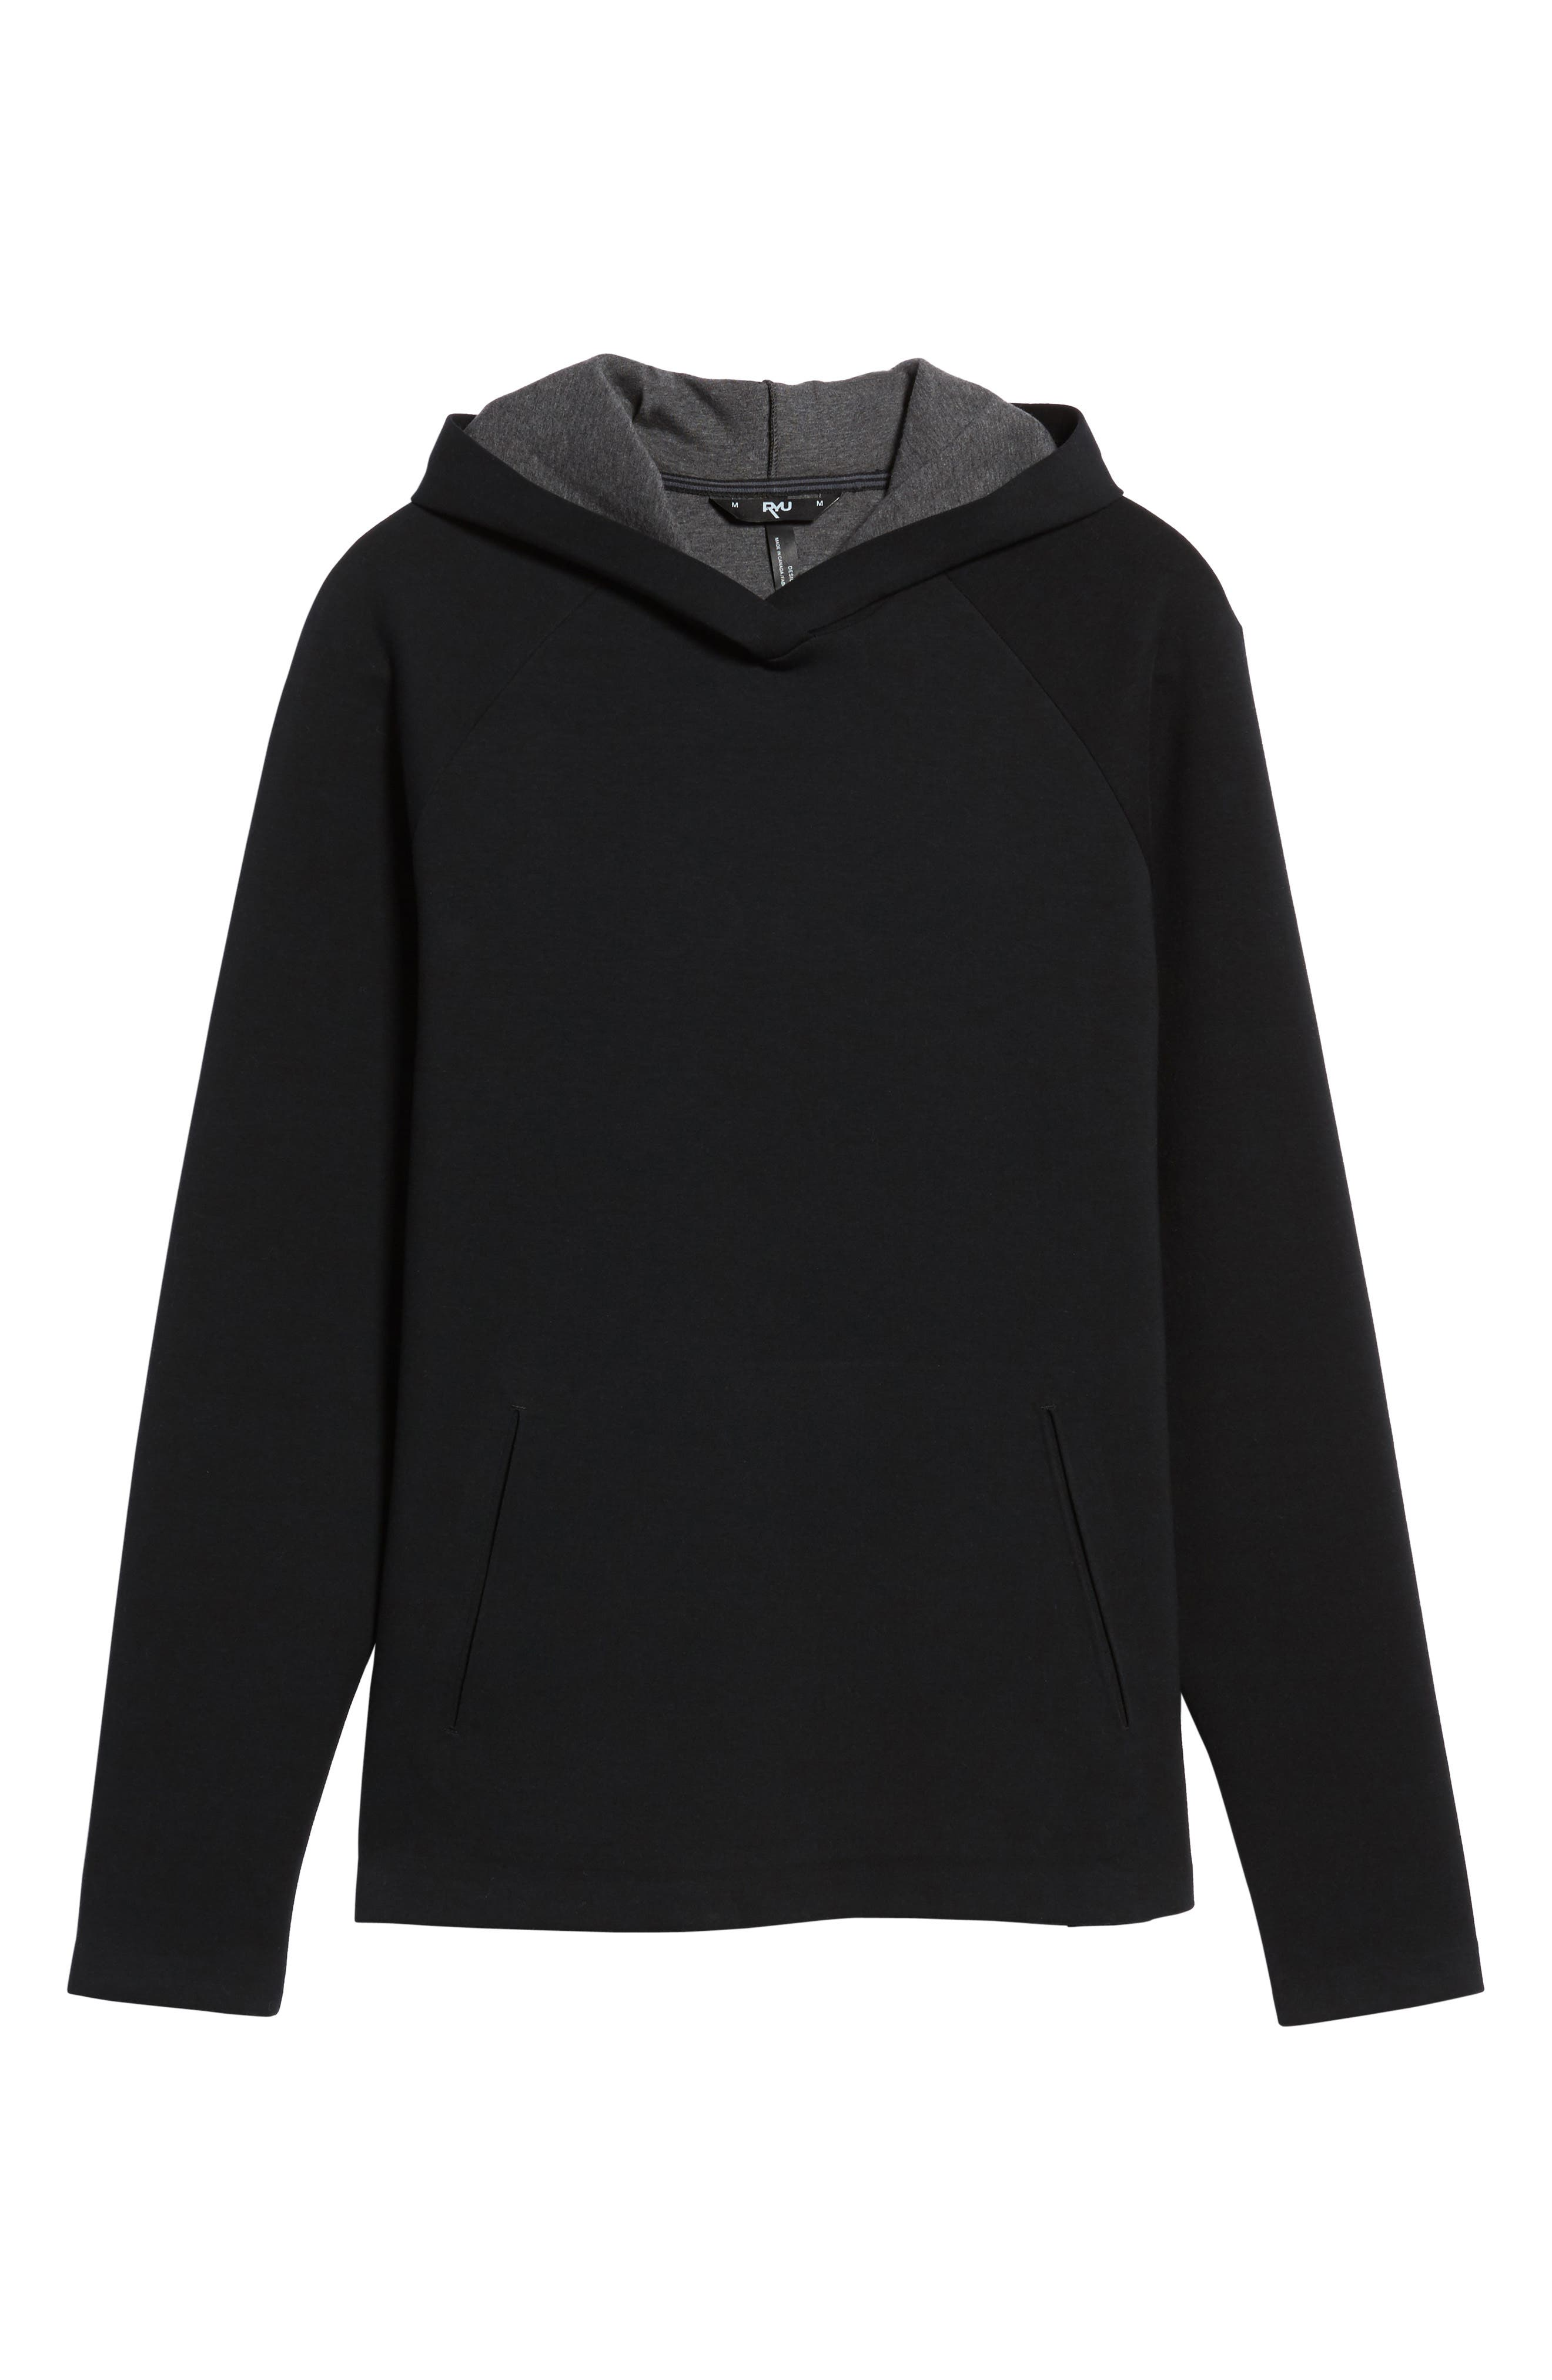 Sportswear AJ11 Hybrid Hoodie,                             Alternate thumbnail 6, color,                             010